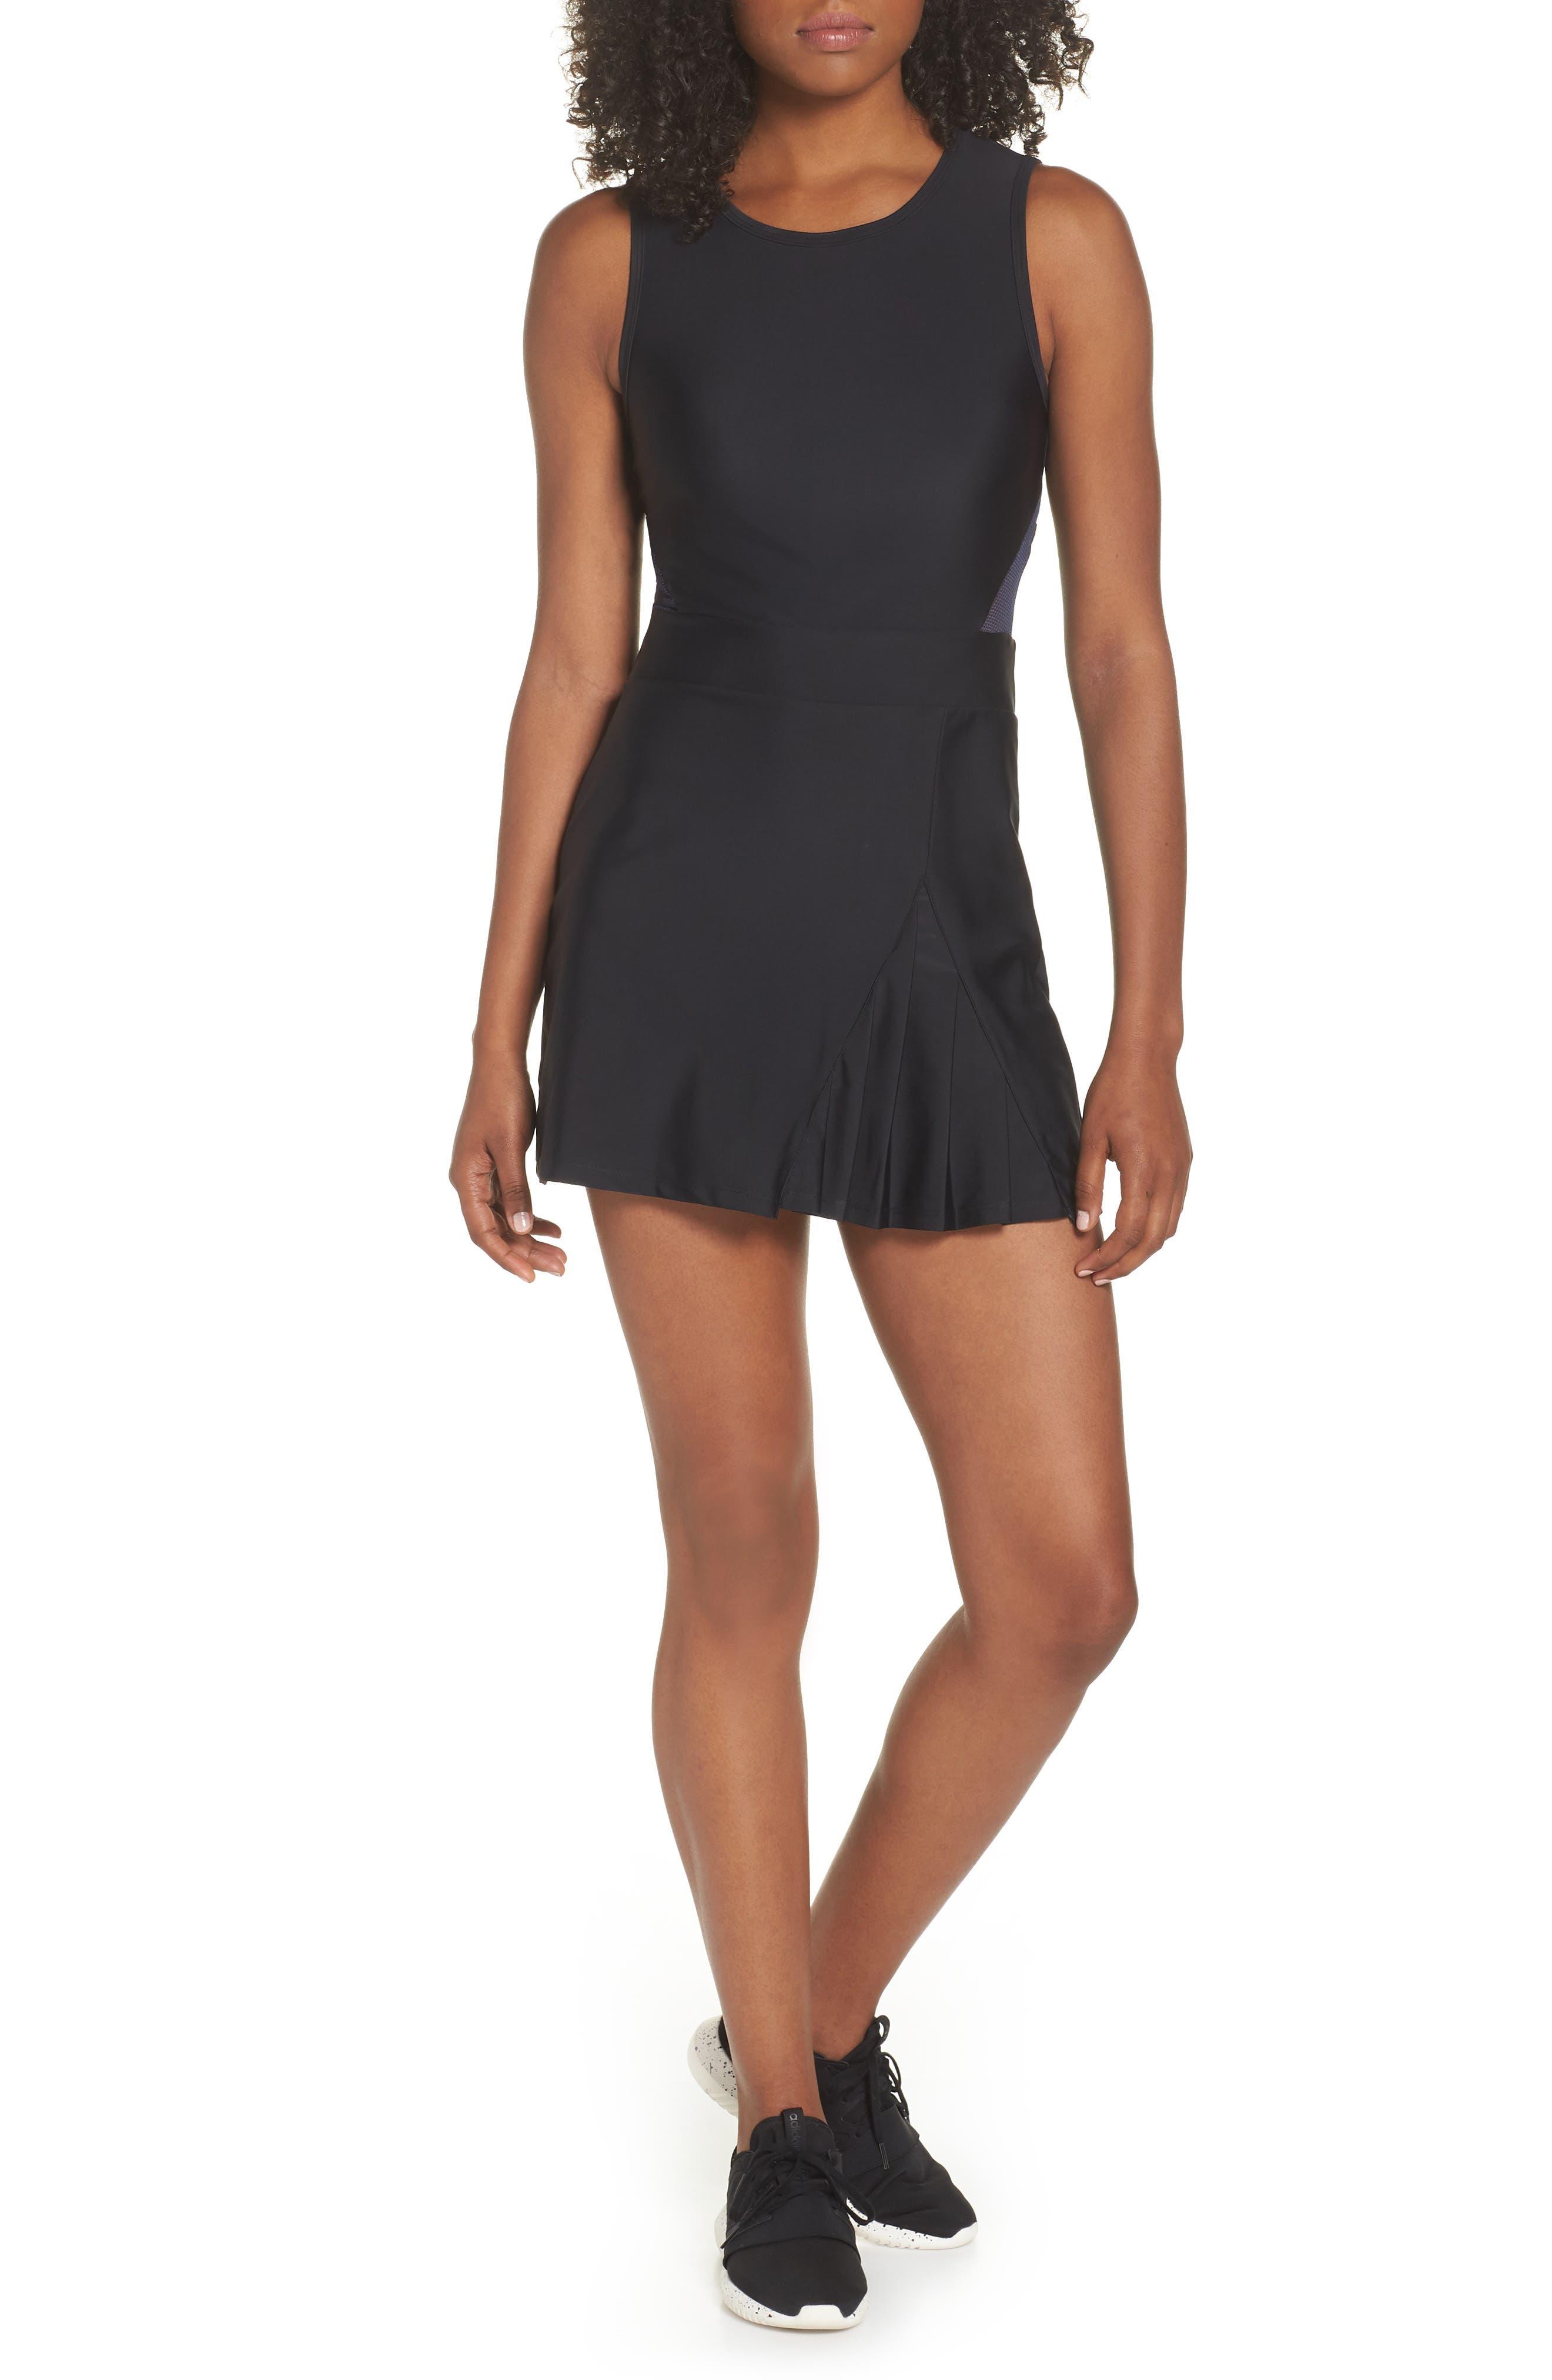 Boomboom Athletica Tennis Dress